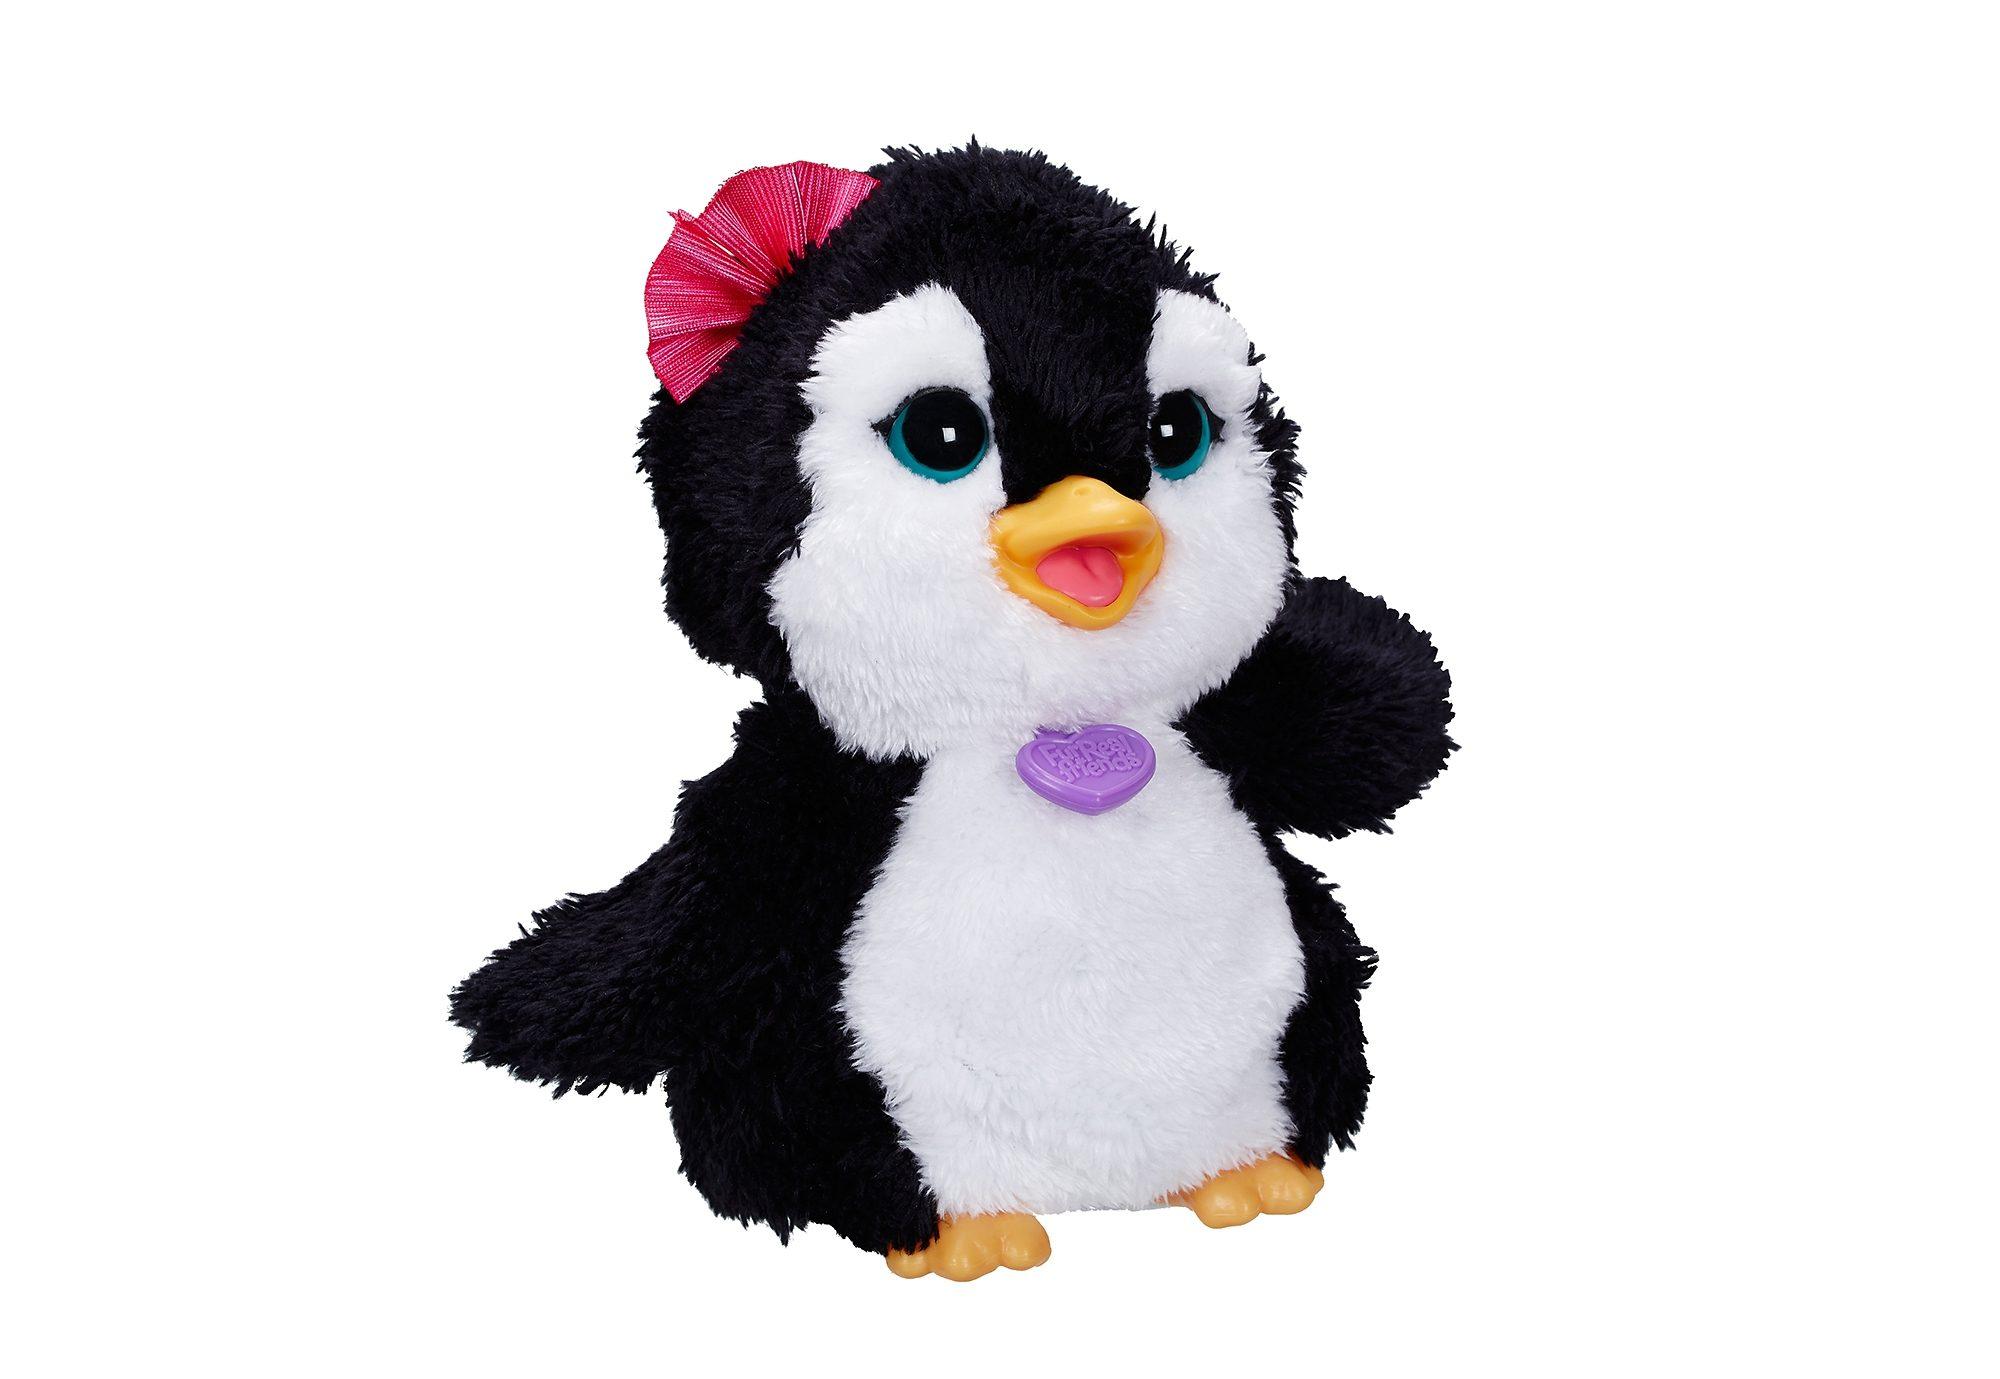 Plüschtier, »FurReal Friends Fröhlicher - Pinguin«, Hasbro